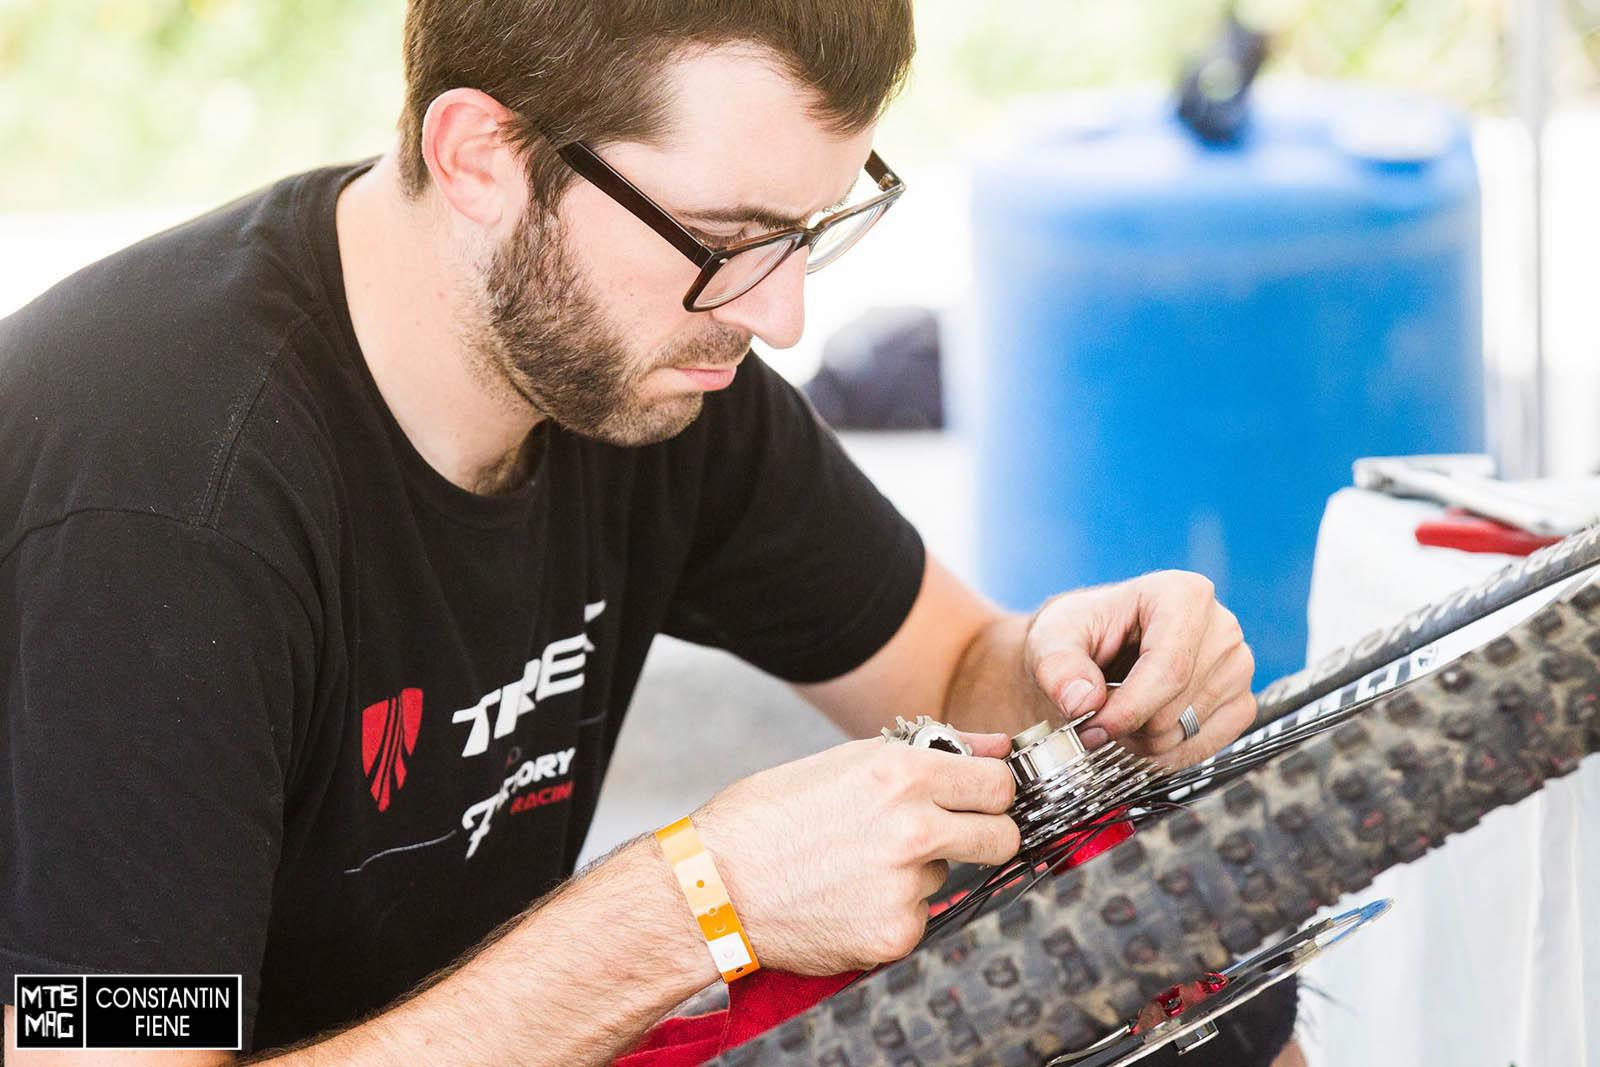 Trek mechanic getting it done.